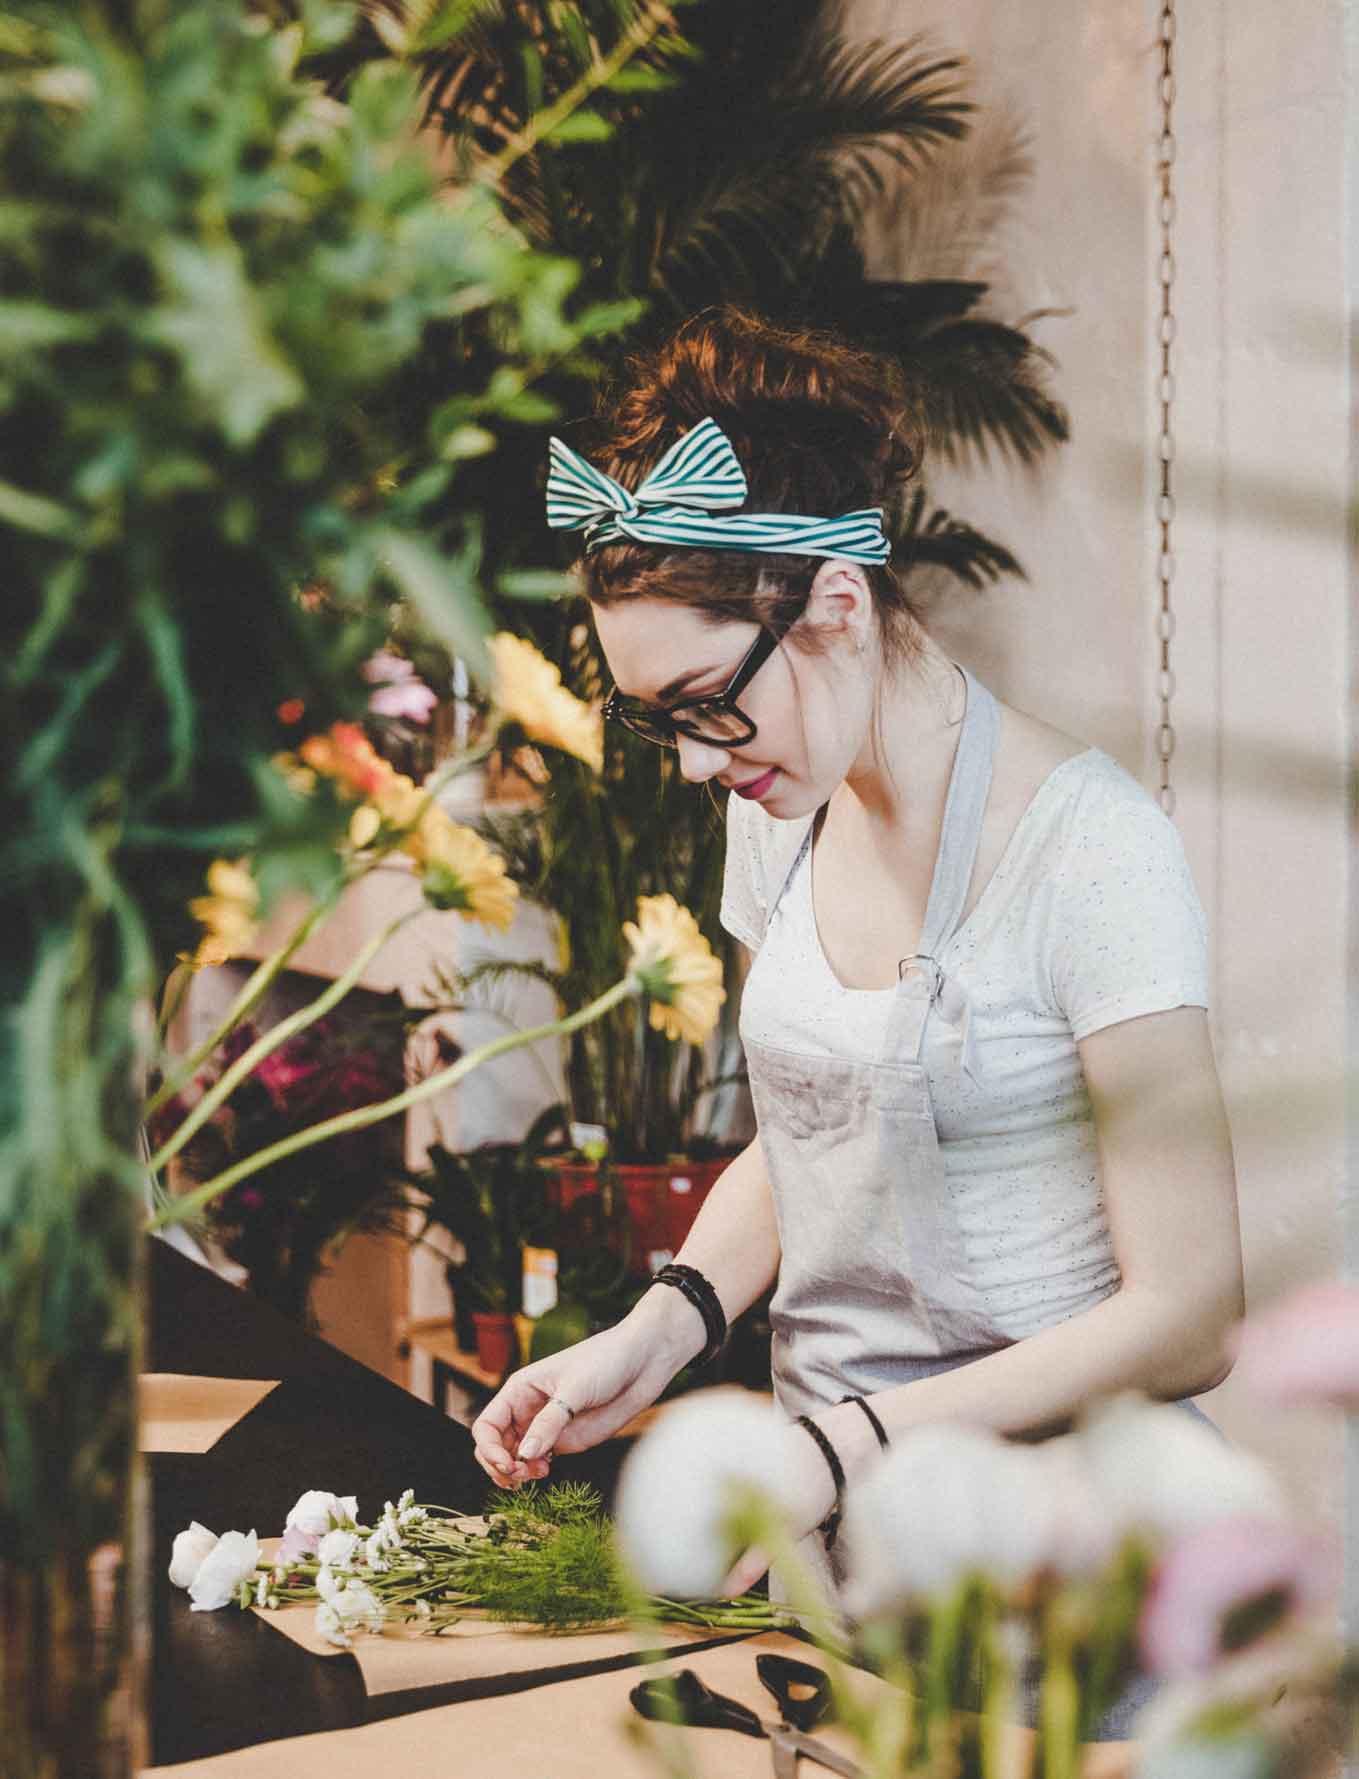 Fotografie Floristing für Branding Floristengeschäft Bern